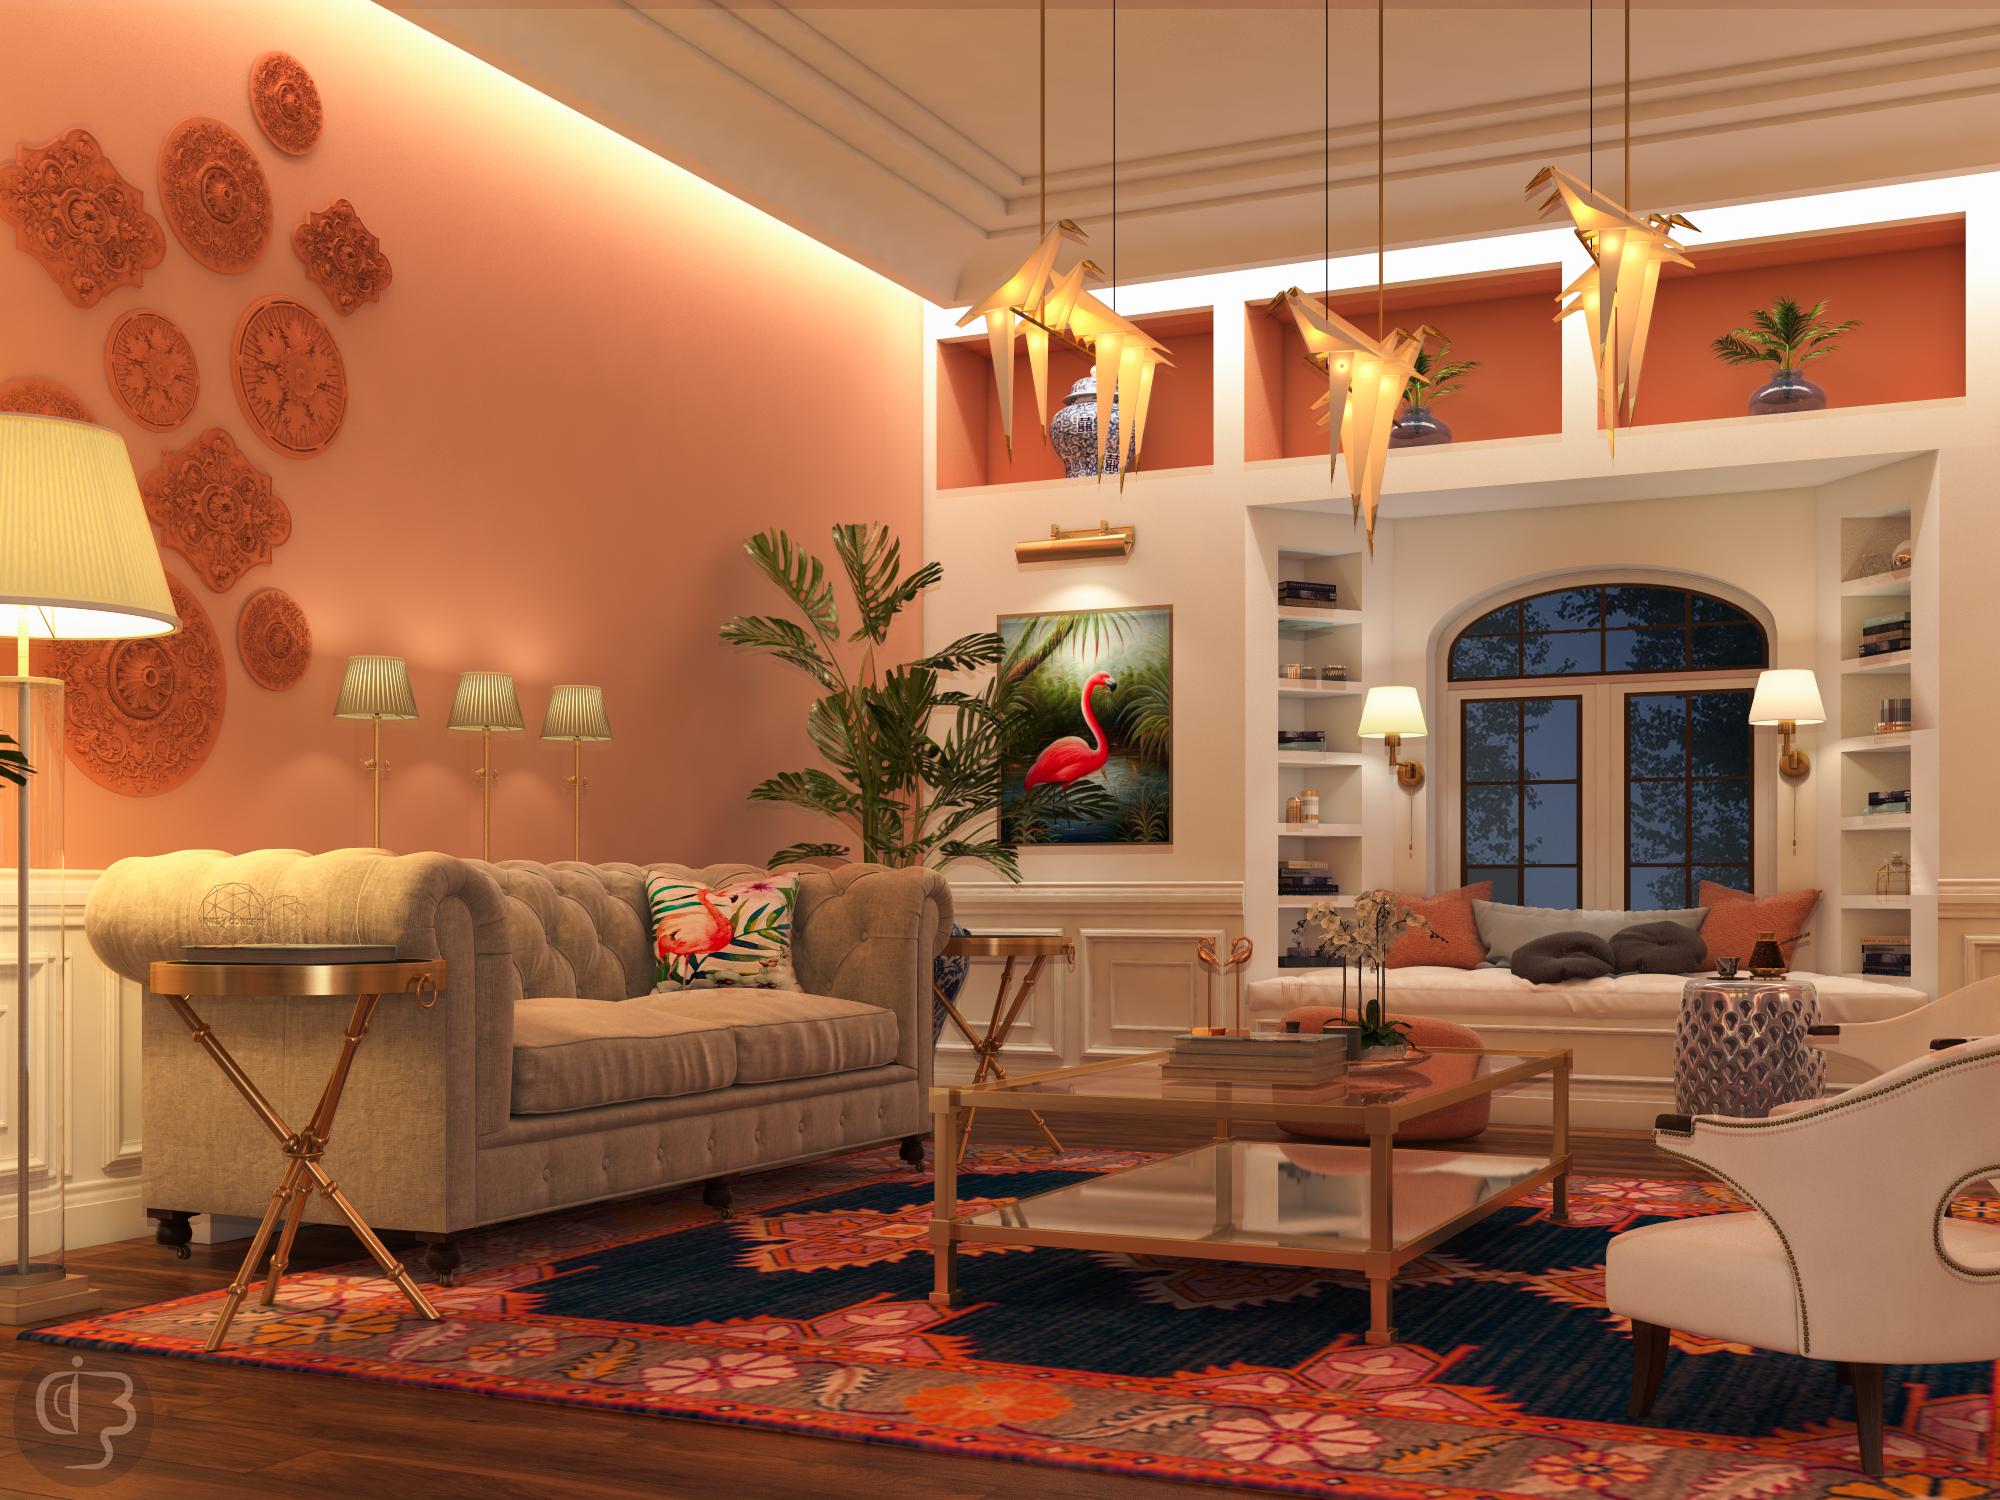 дизайн интерьера Красивый дизайн интерьера от Boshrainteriors Studio и BRABBU living room by boshrainteriors 1